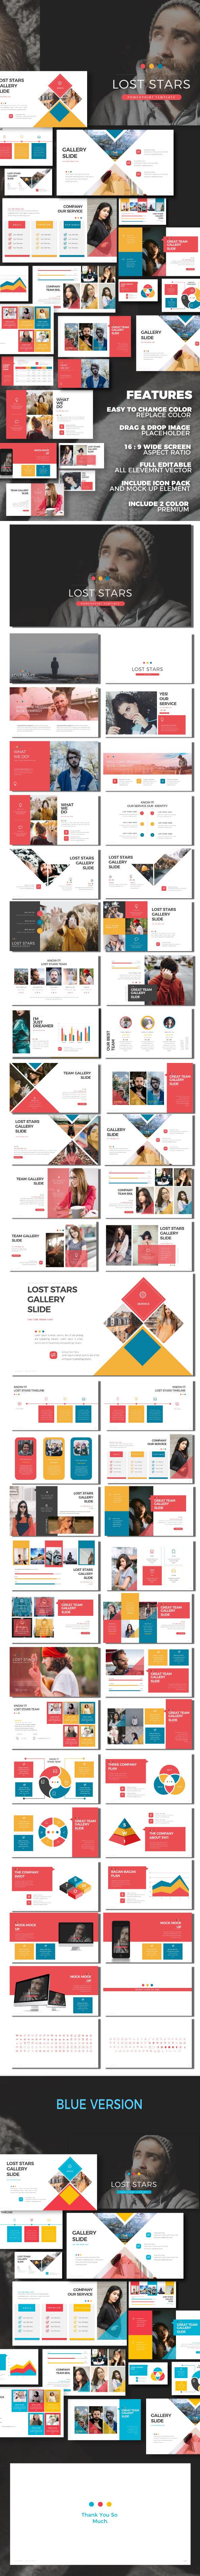 Lost Stars - Keynote Presentation Templates - Business Keynote Templates